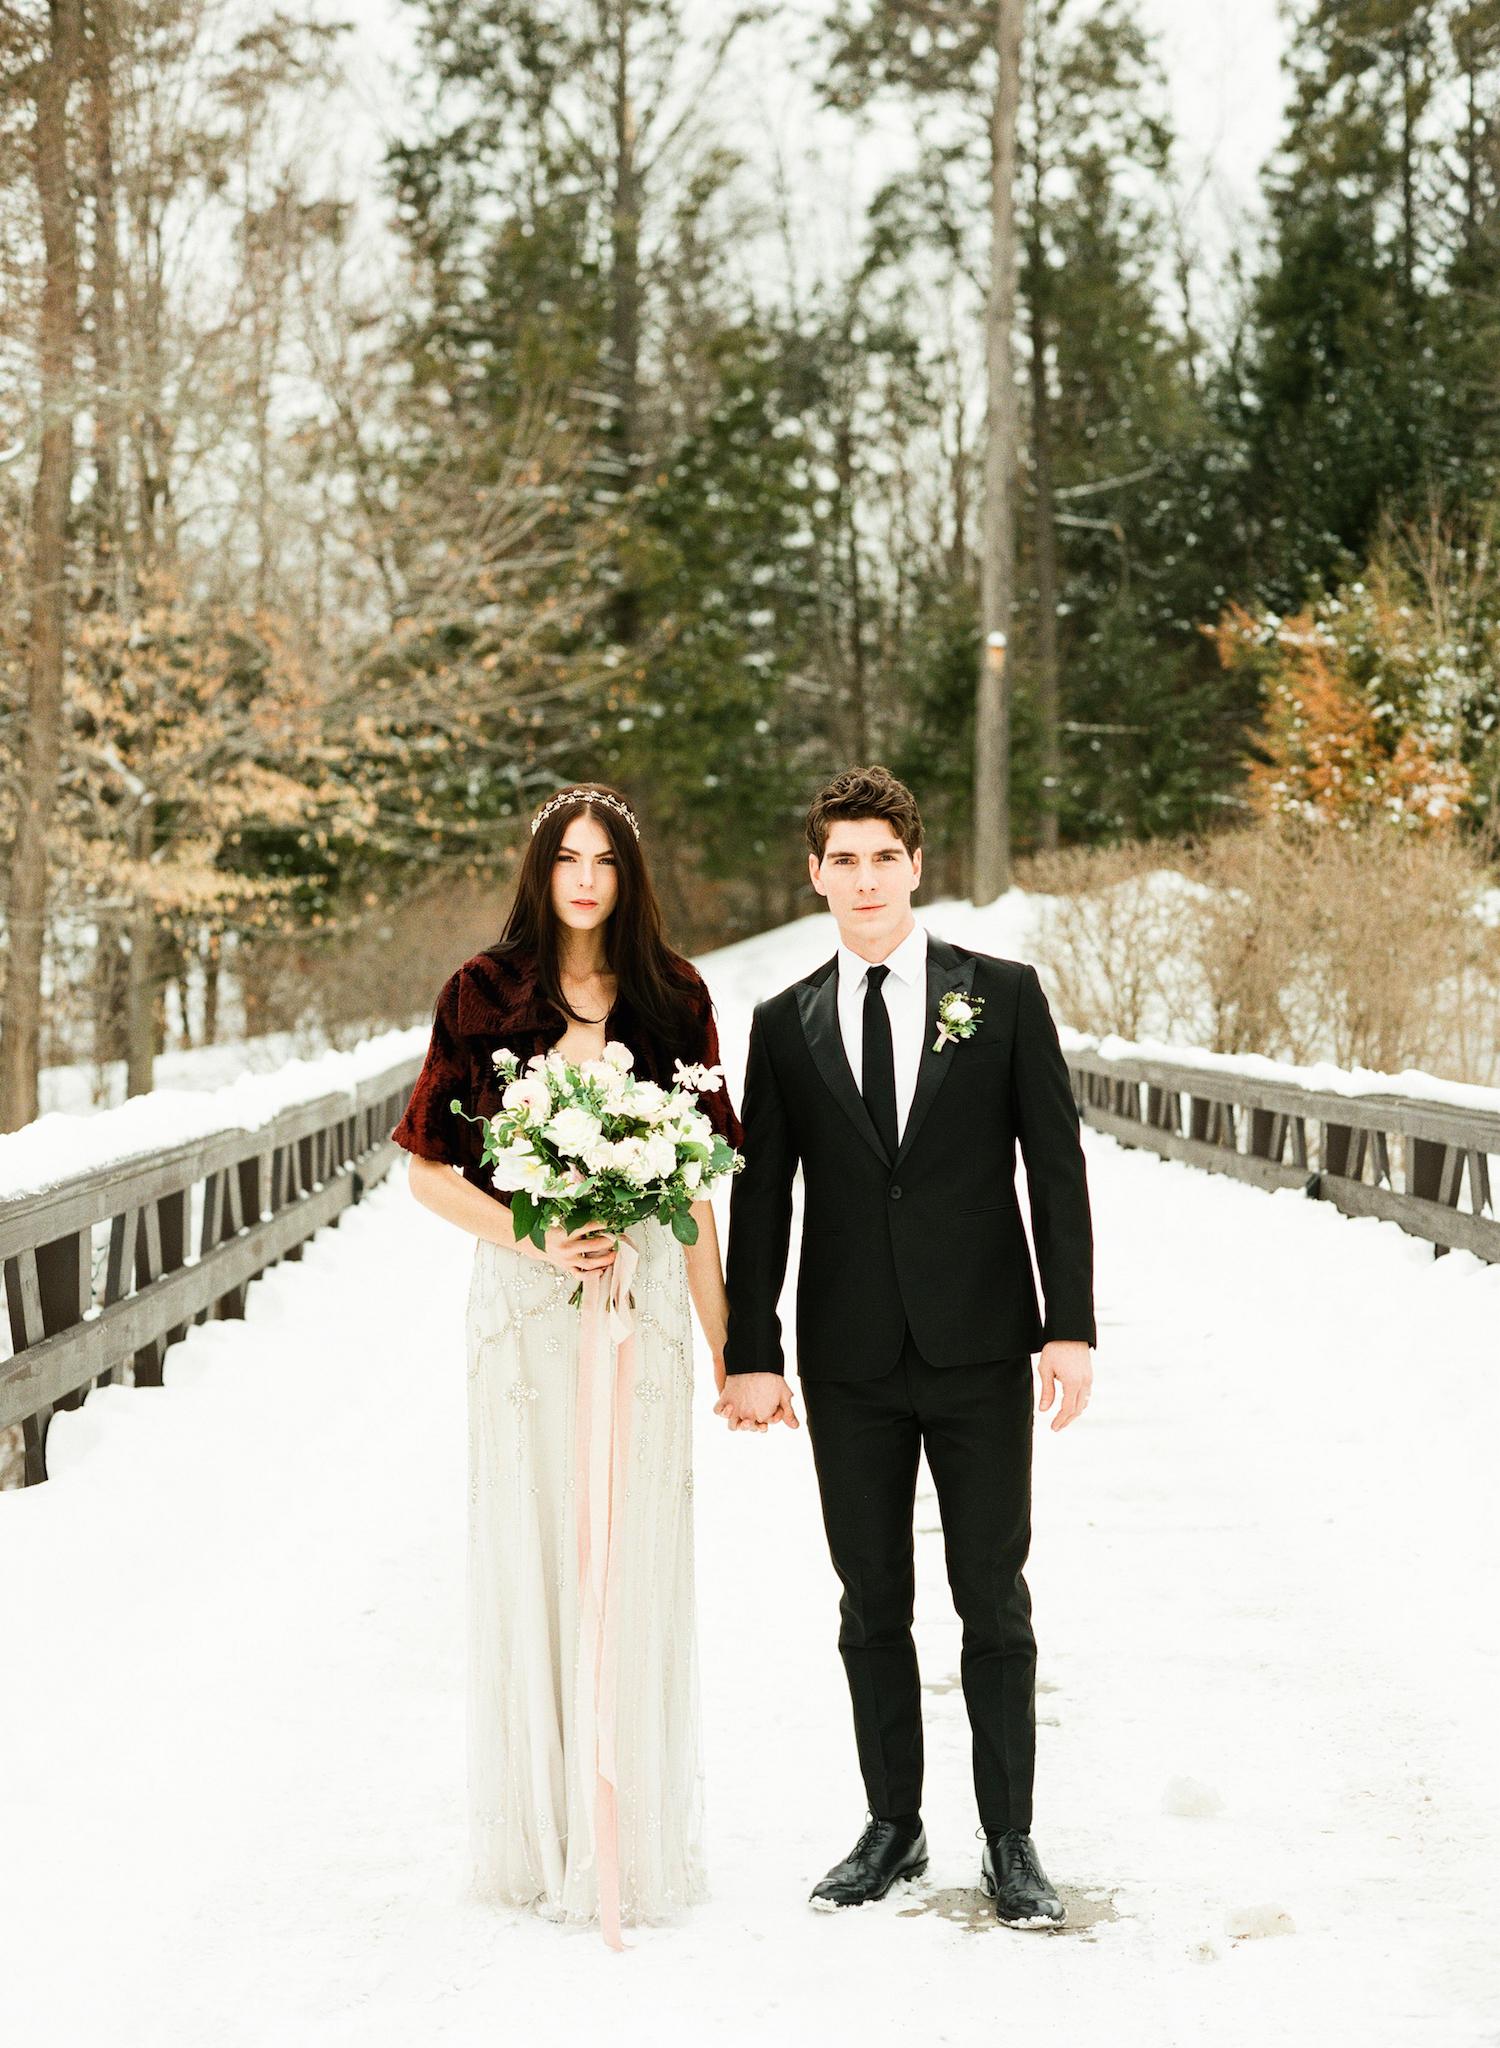 Winter Editorial-JennyPackham-LindsayMaddenPhotography-04 copy.jpg